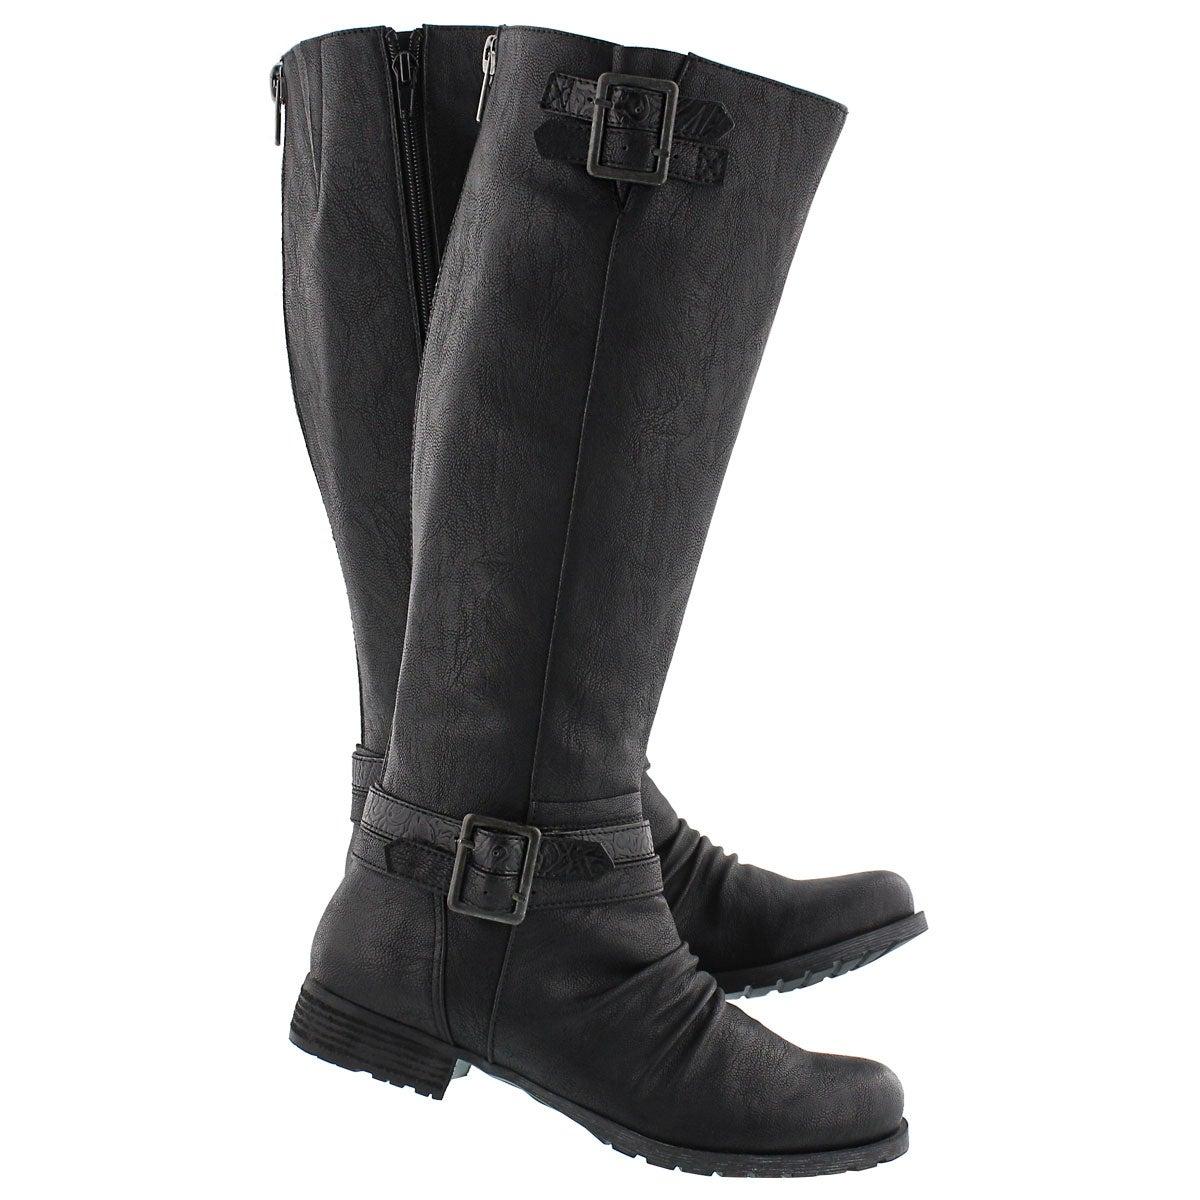 Lds Blixi II black riding boot